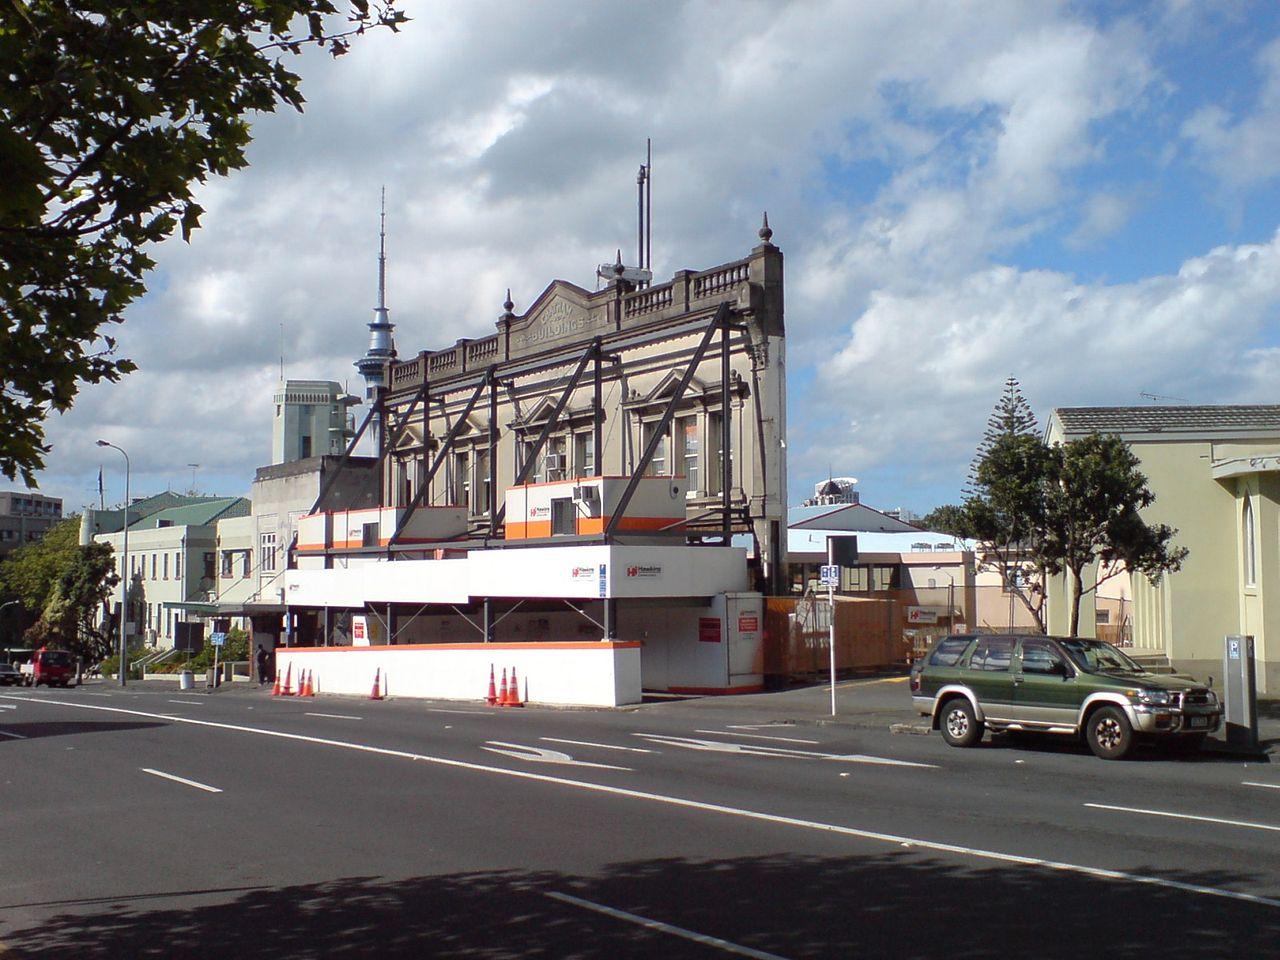 Potemkin Village Facade, Auckland, Ingolfson